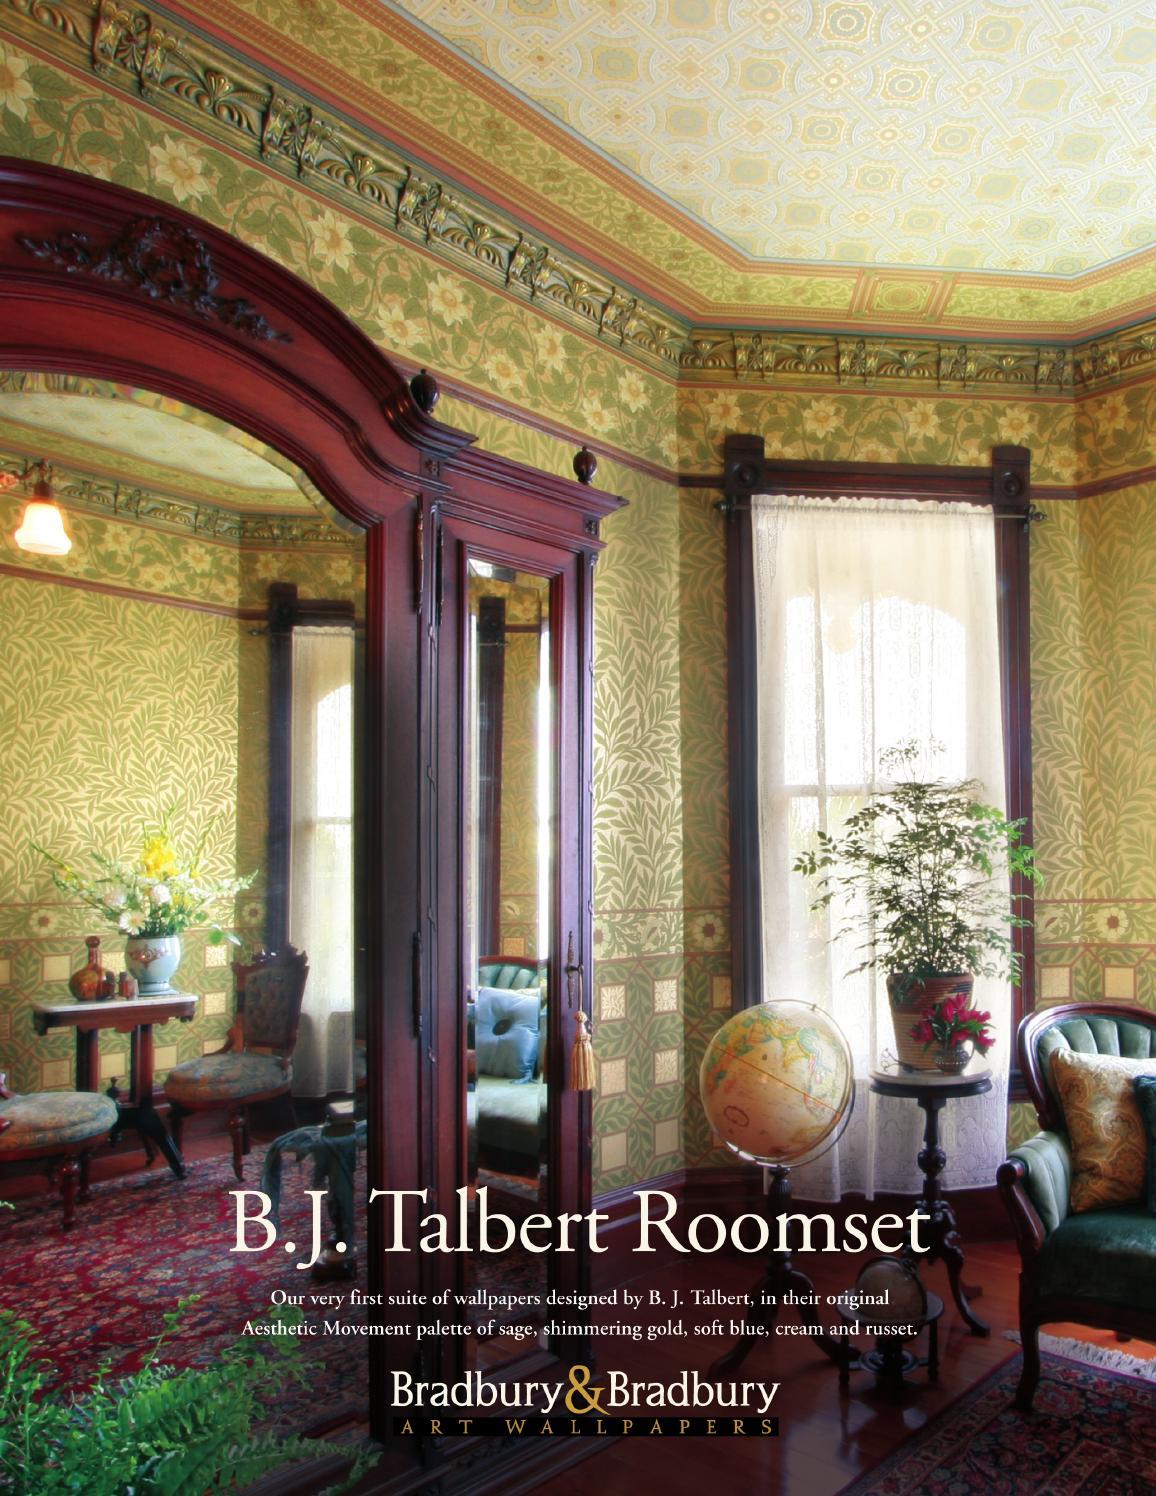 b j talbert wallpaper collection by bradbury bradbury art wallpapers issuu. Black Bedroom Furniture Sets. Home Design Ideas